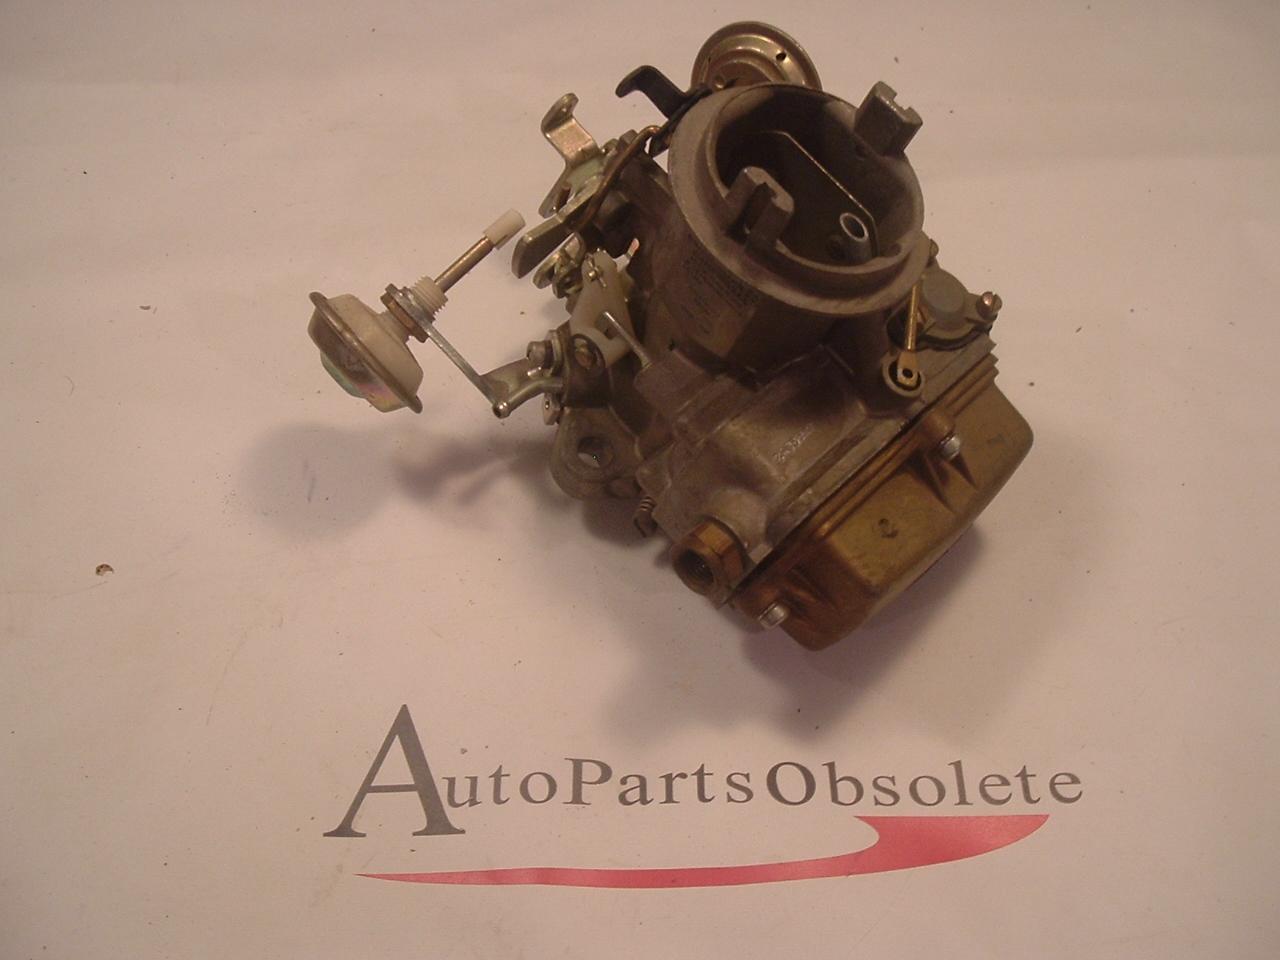 1962 -68 Dodge plymouth carburetor slant six Holley 3277